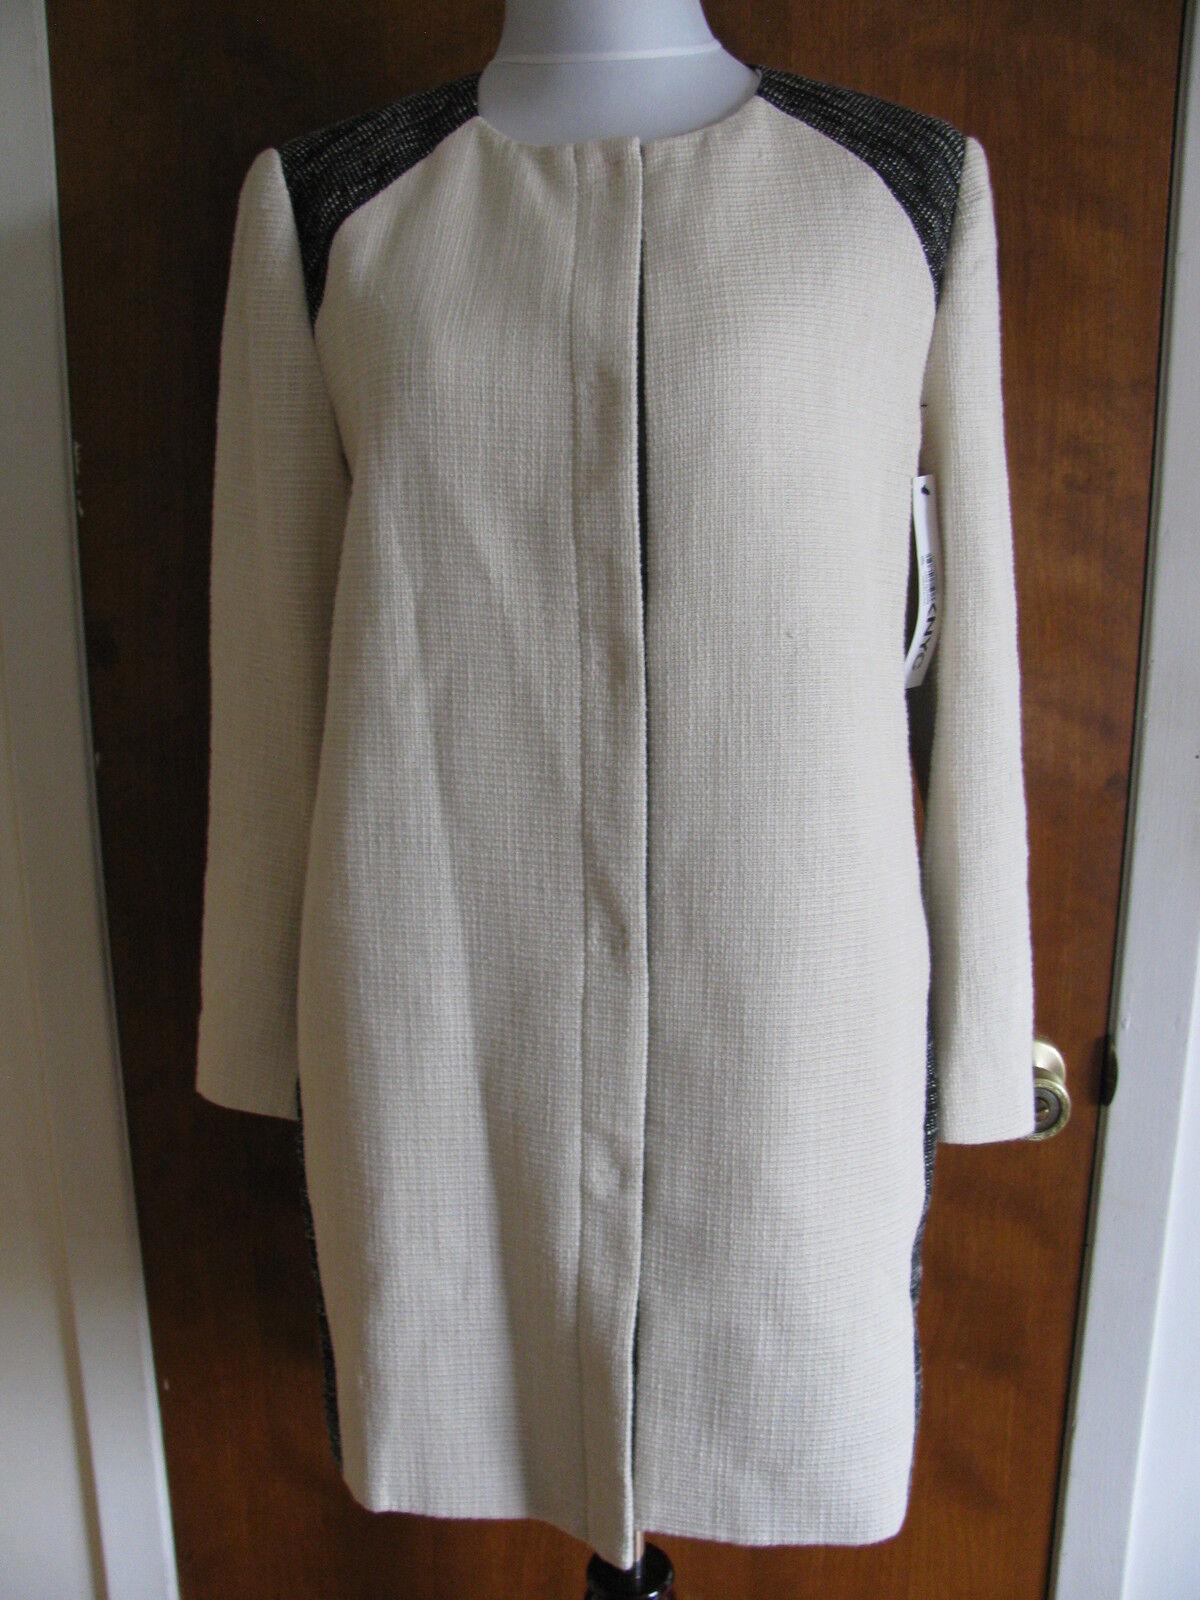 DKNY women's chark stylish lined lightweight coat size Large NWT